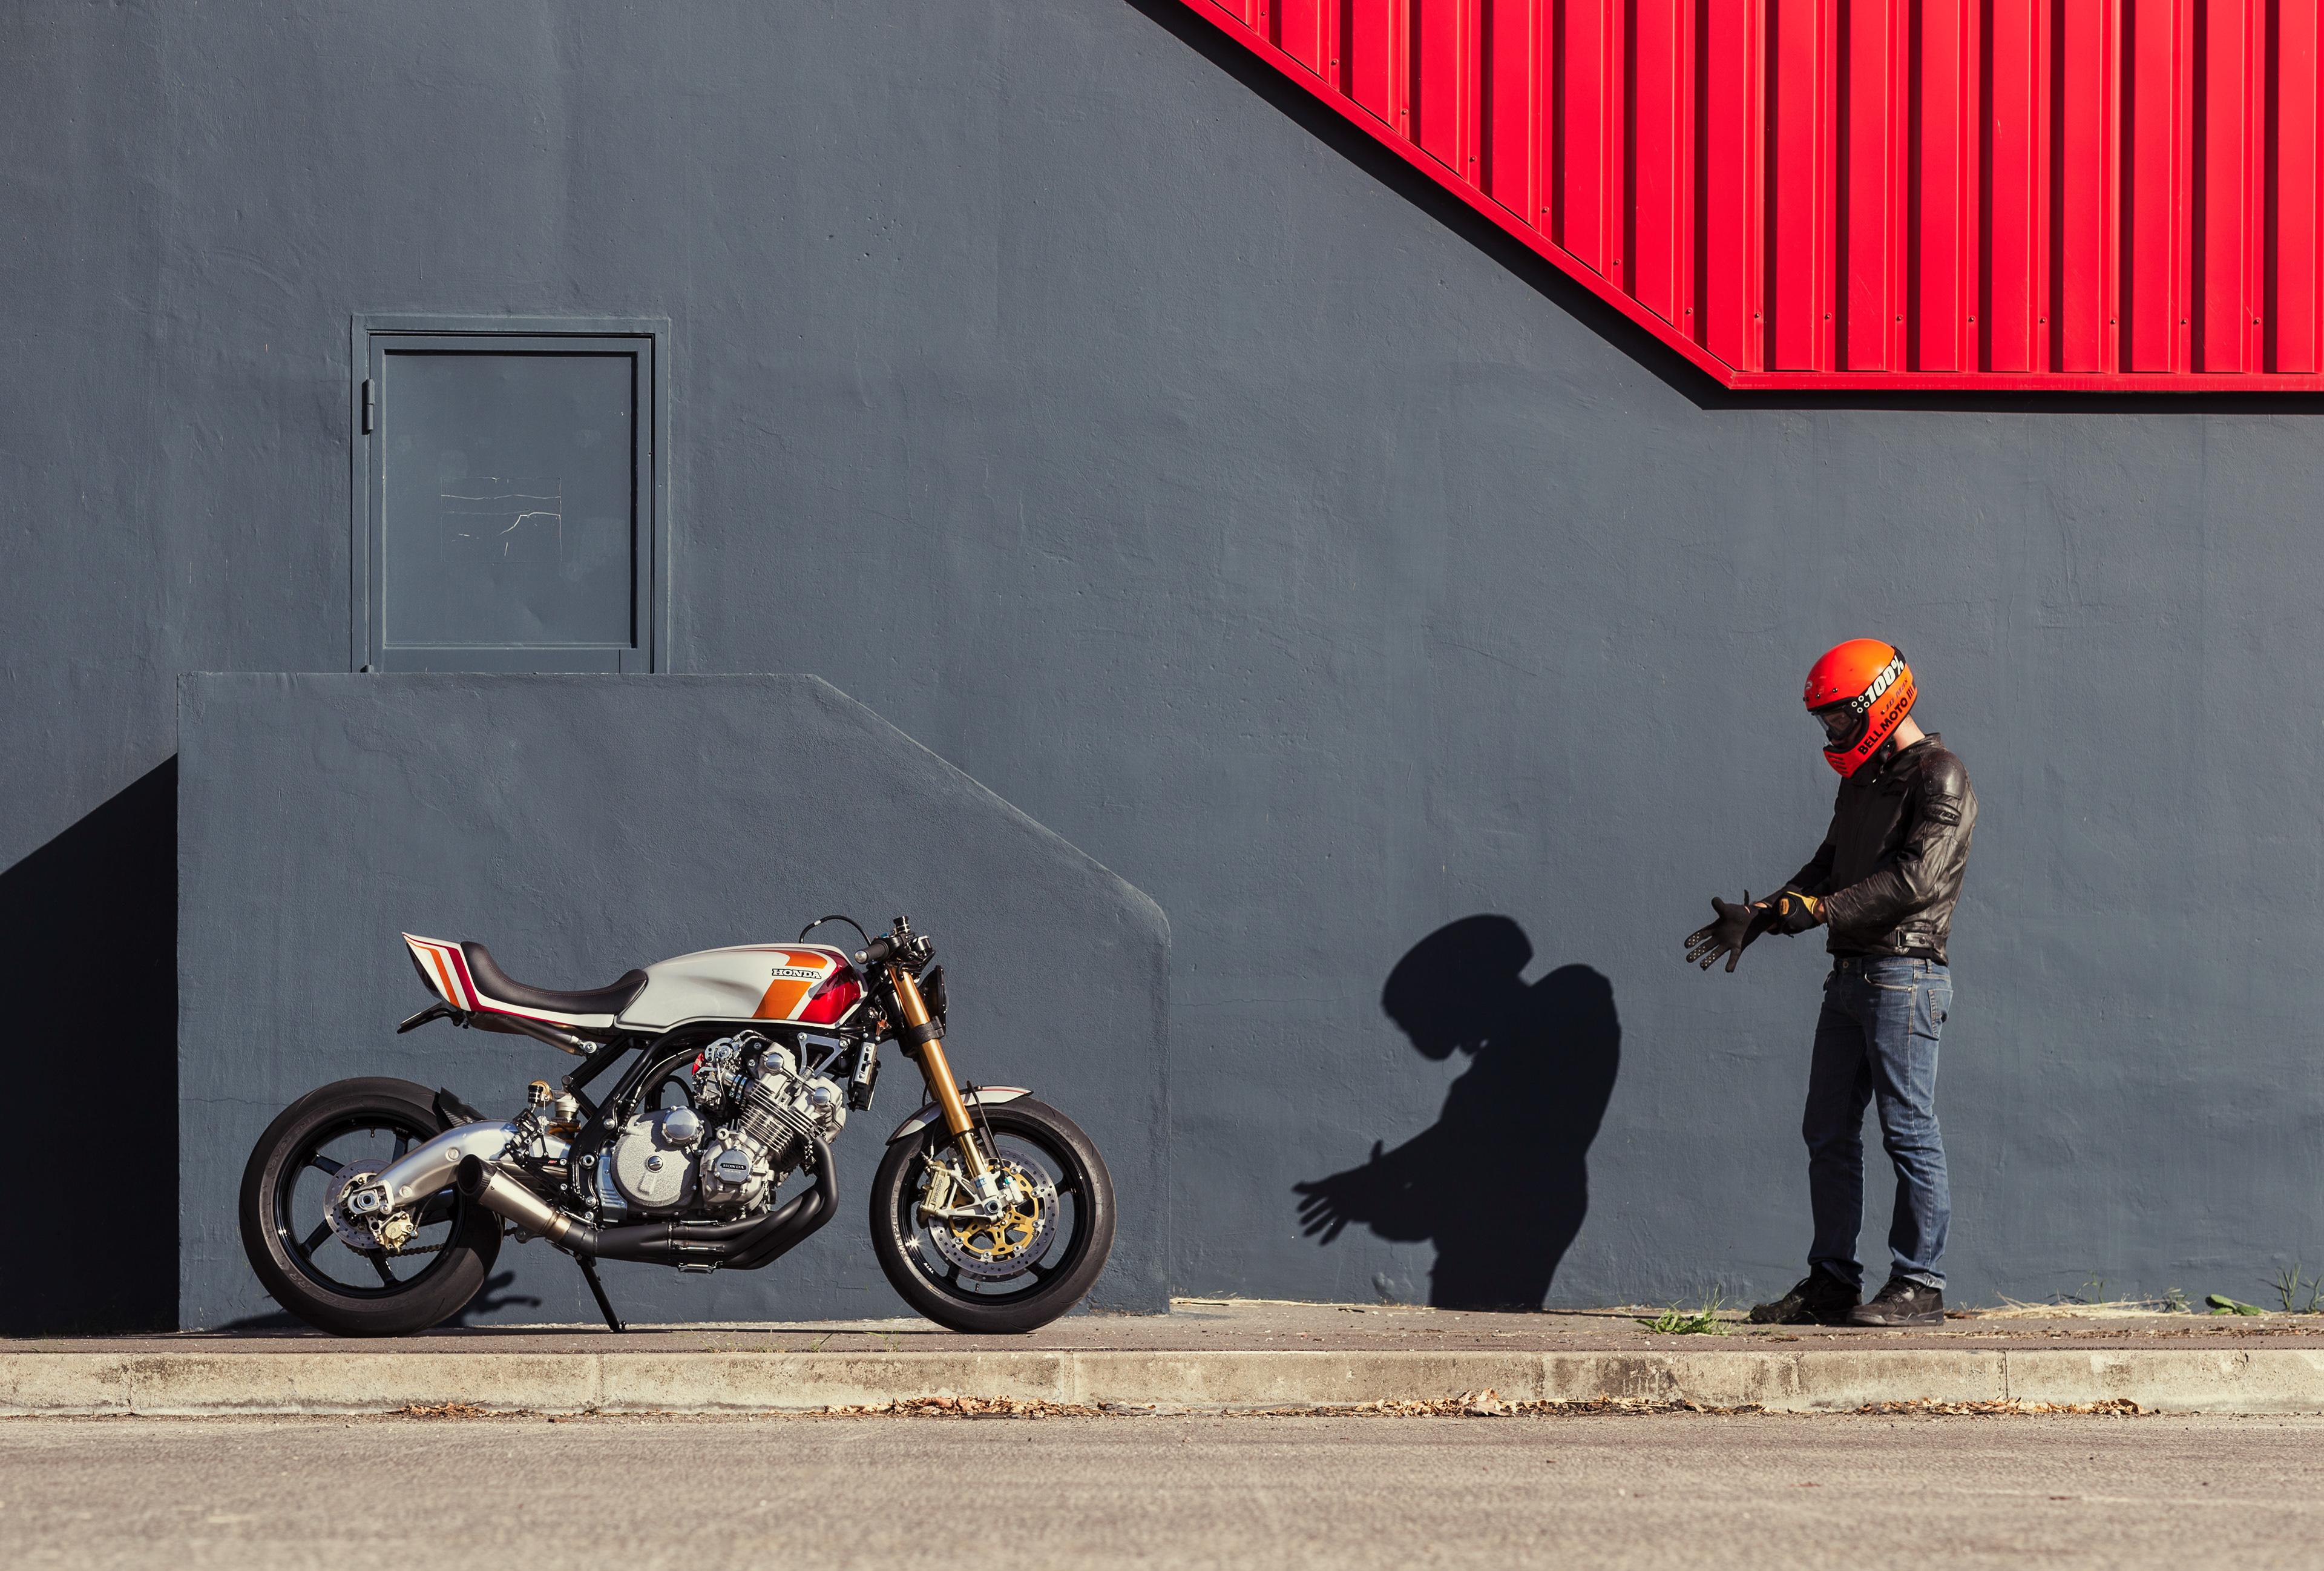 Jean François Muguet Photographe Portfolio Motorcycle